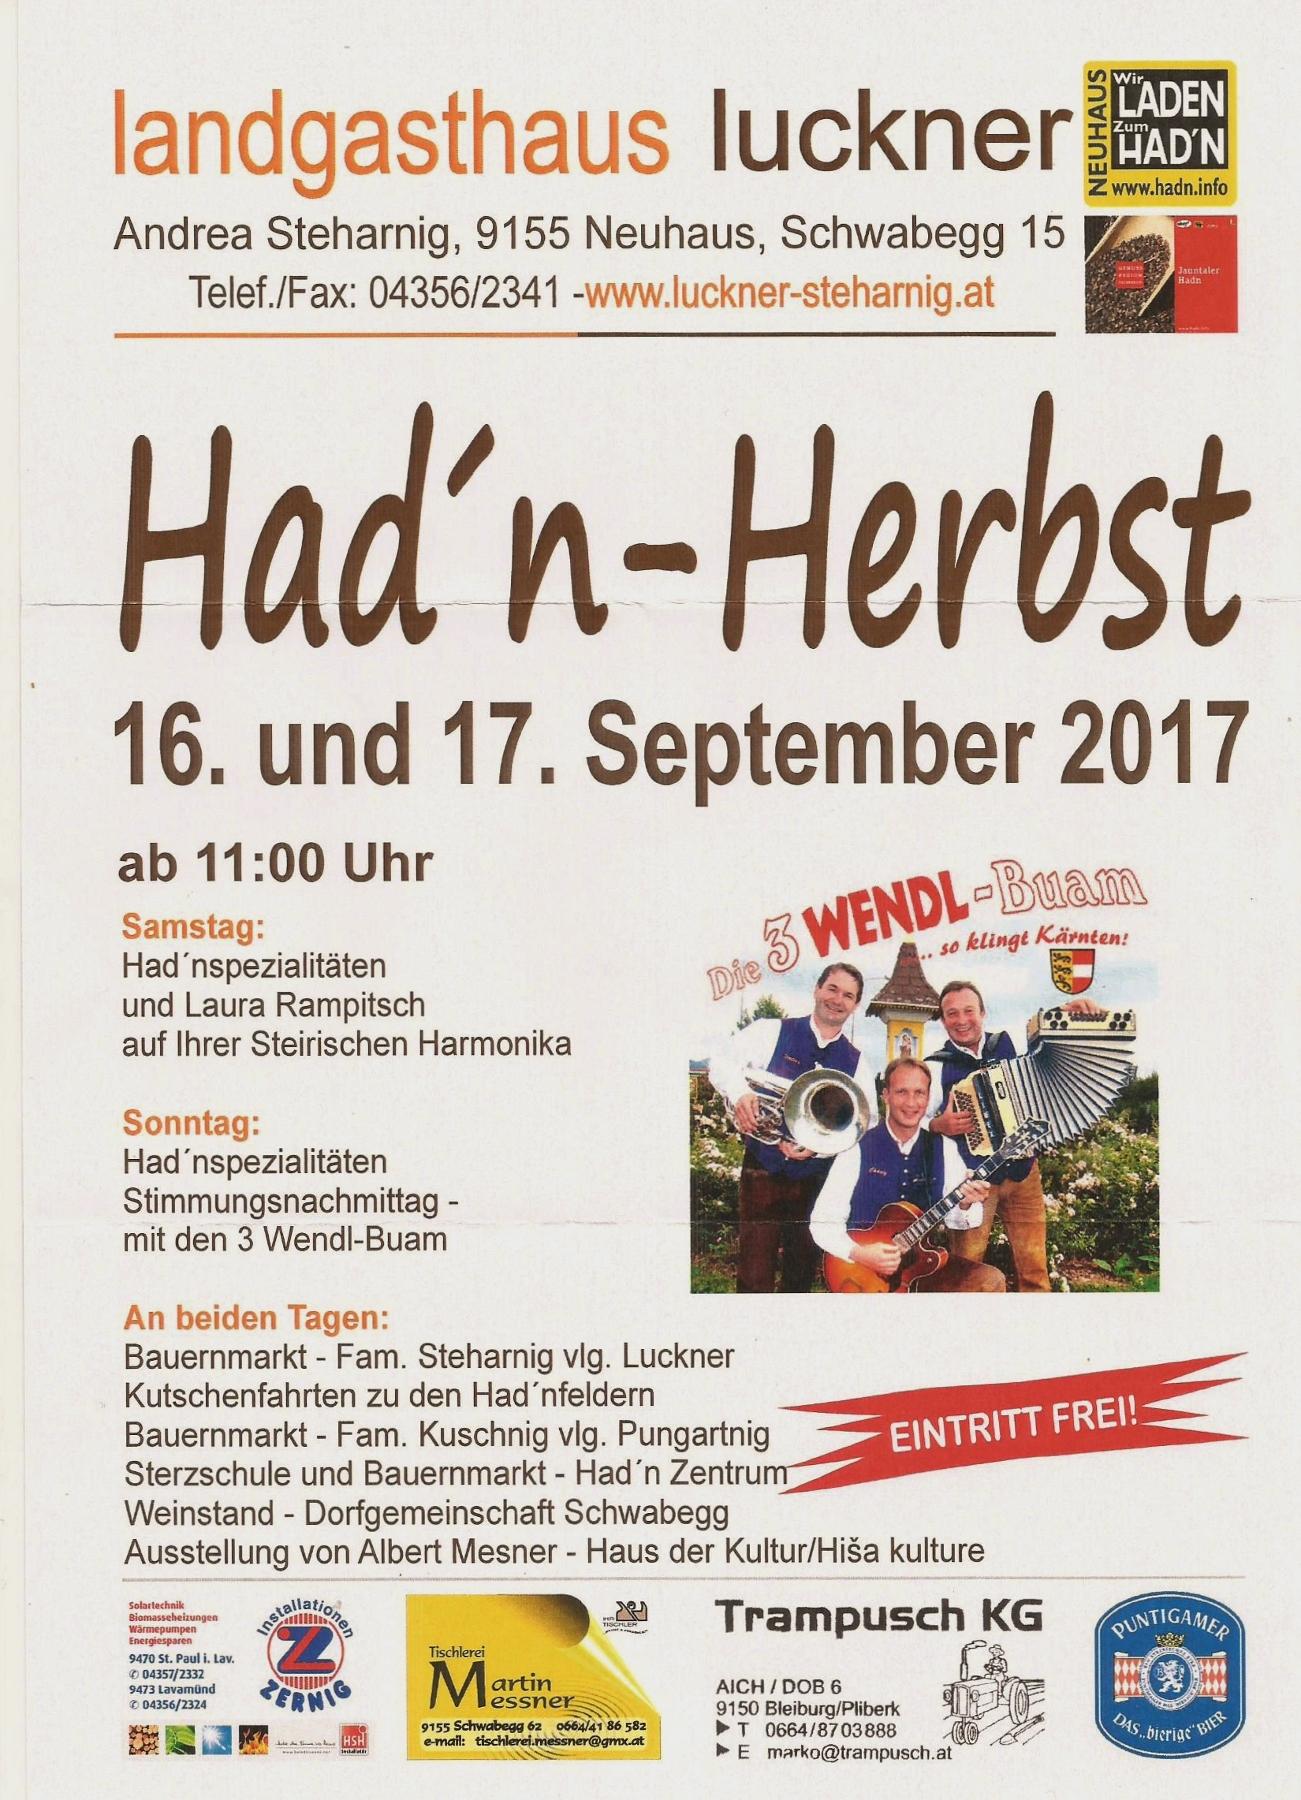 Luckner Hadnherbst (1301x1800)